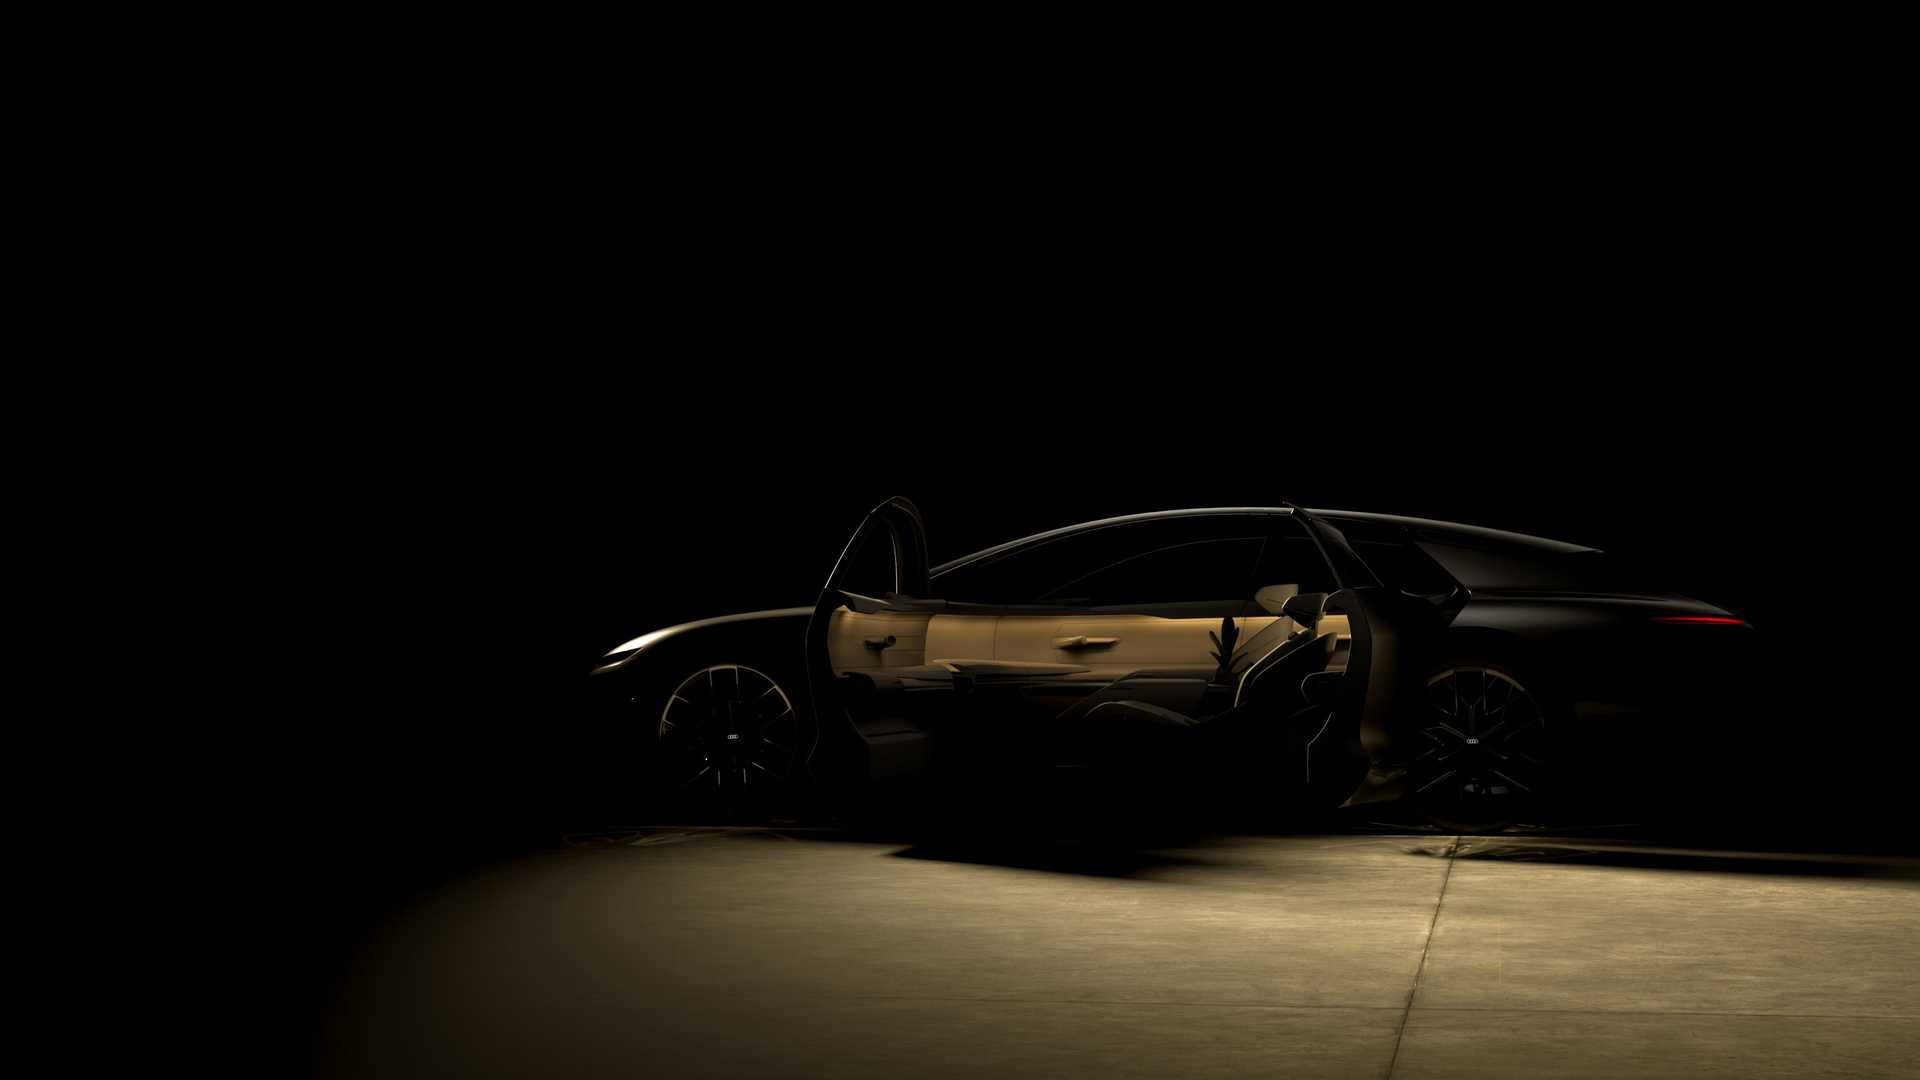 El Audi Grand Sphere Concept es un A7 Sportback eléctrico